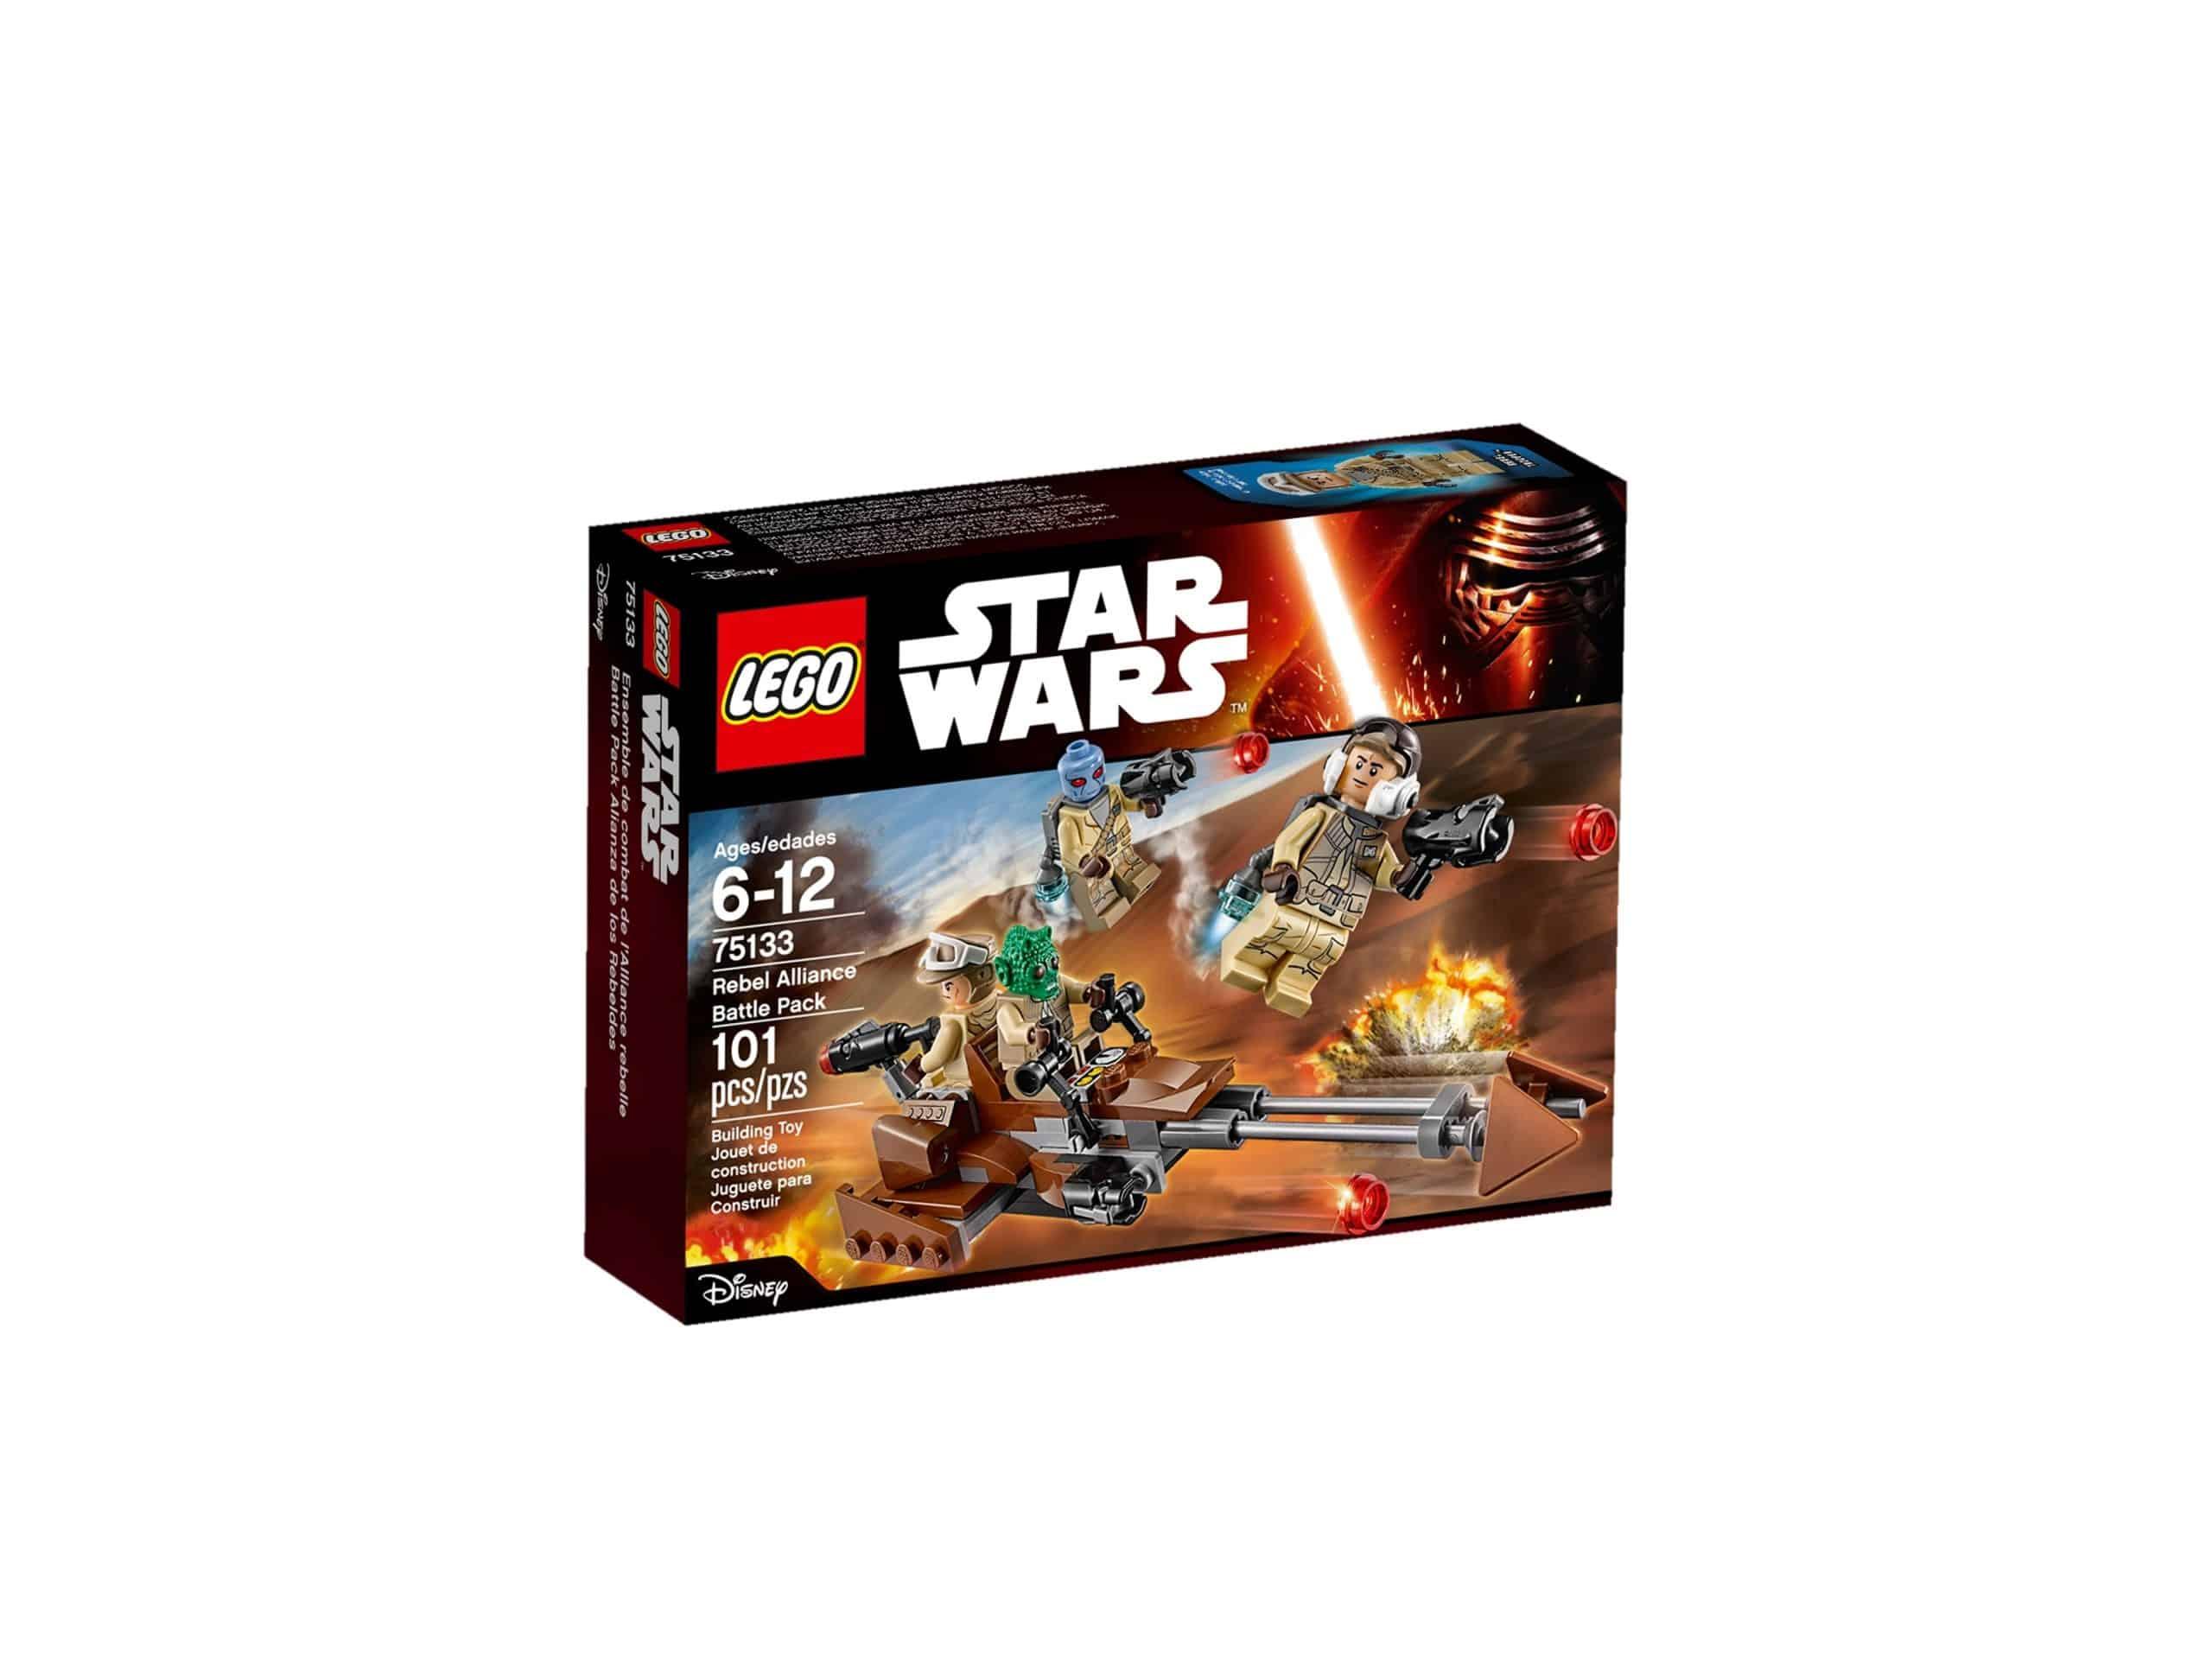 lego 75133 rebel alliance battle pack scaled